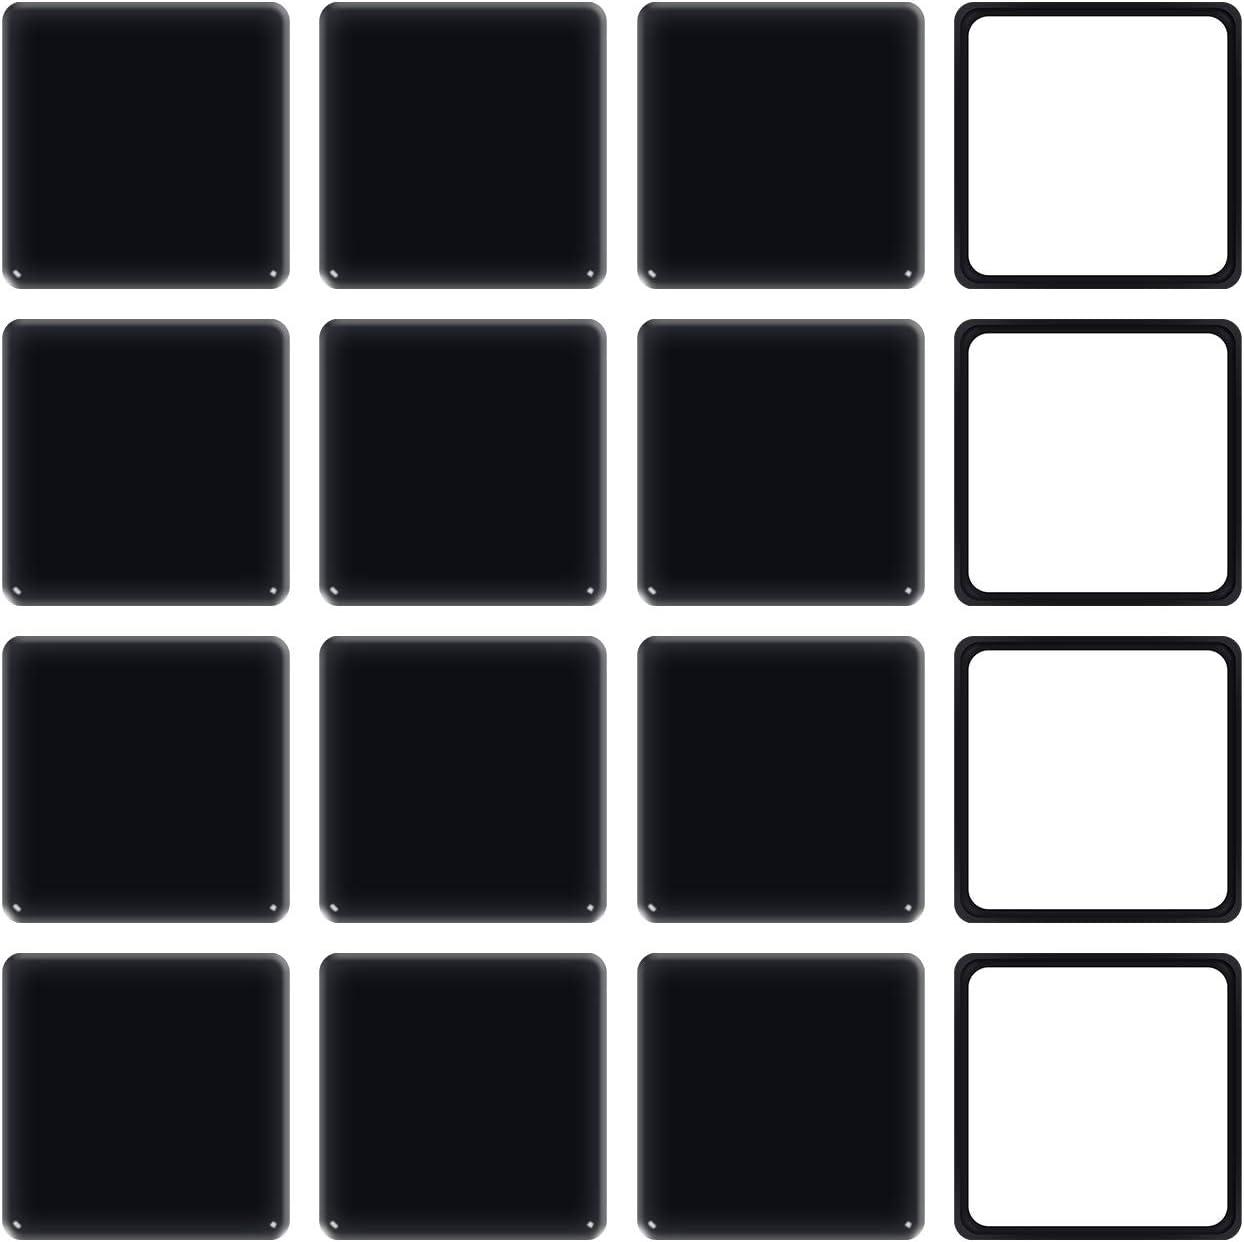 "Ezprotekt Square Black 16 Pack Self-Stick Furniture Sliders 2-1/2"" Furniture Moving Pads Heavy Duty Adhesive Furniture Movers for Carpet"